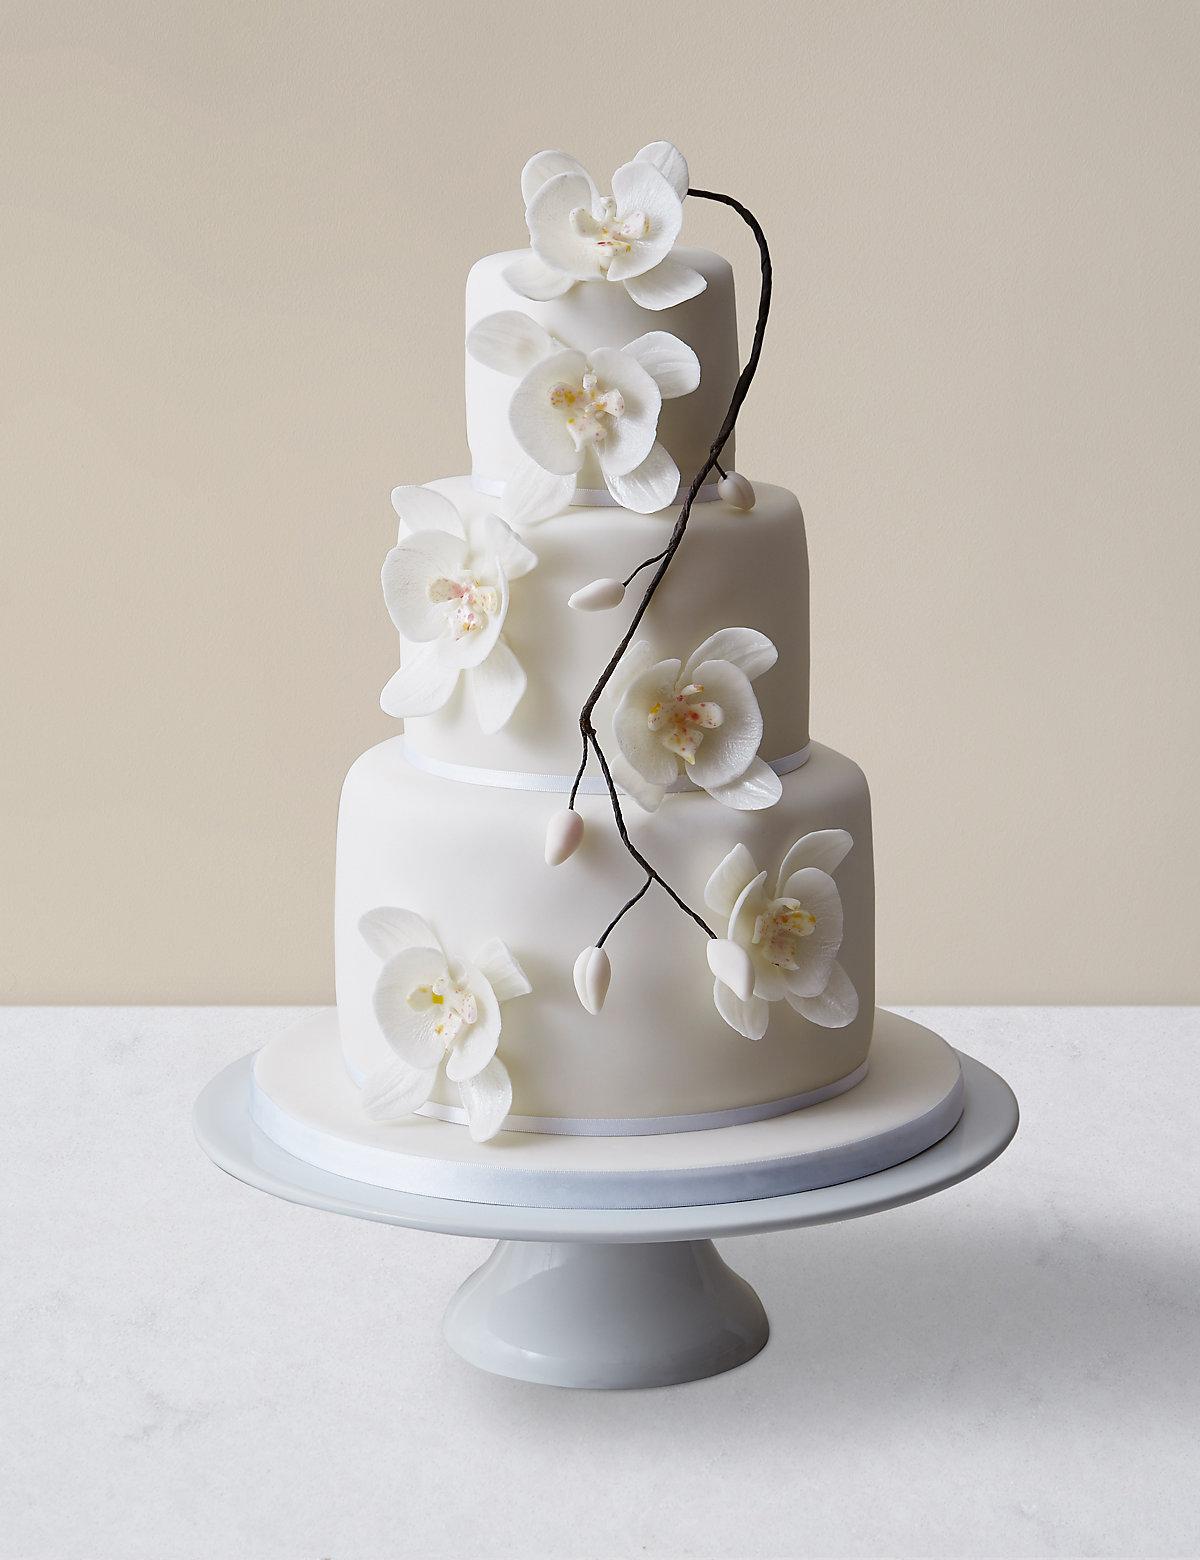 Exelent Wedding Cake M&s Component - The Wedding Ideas ...